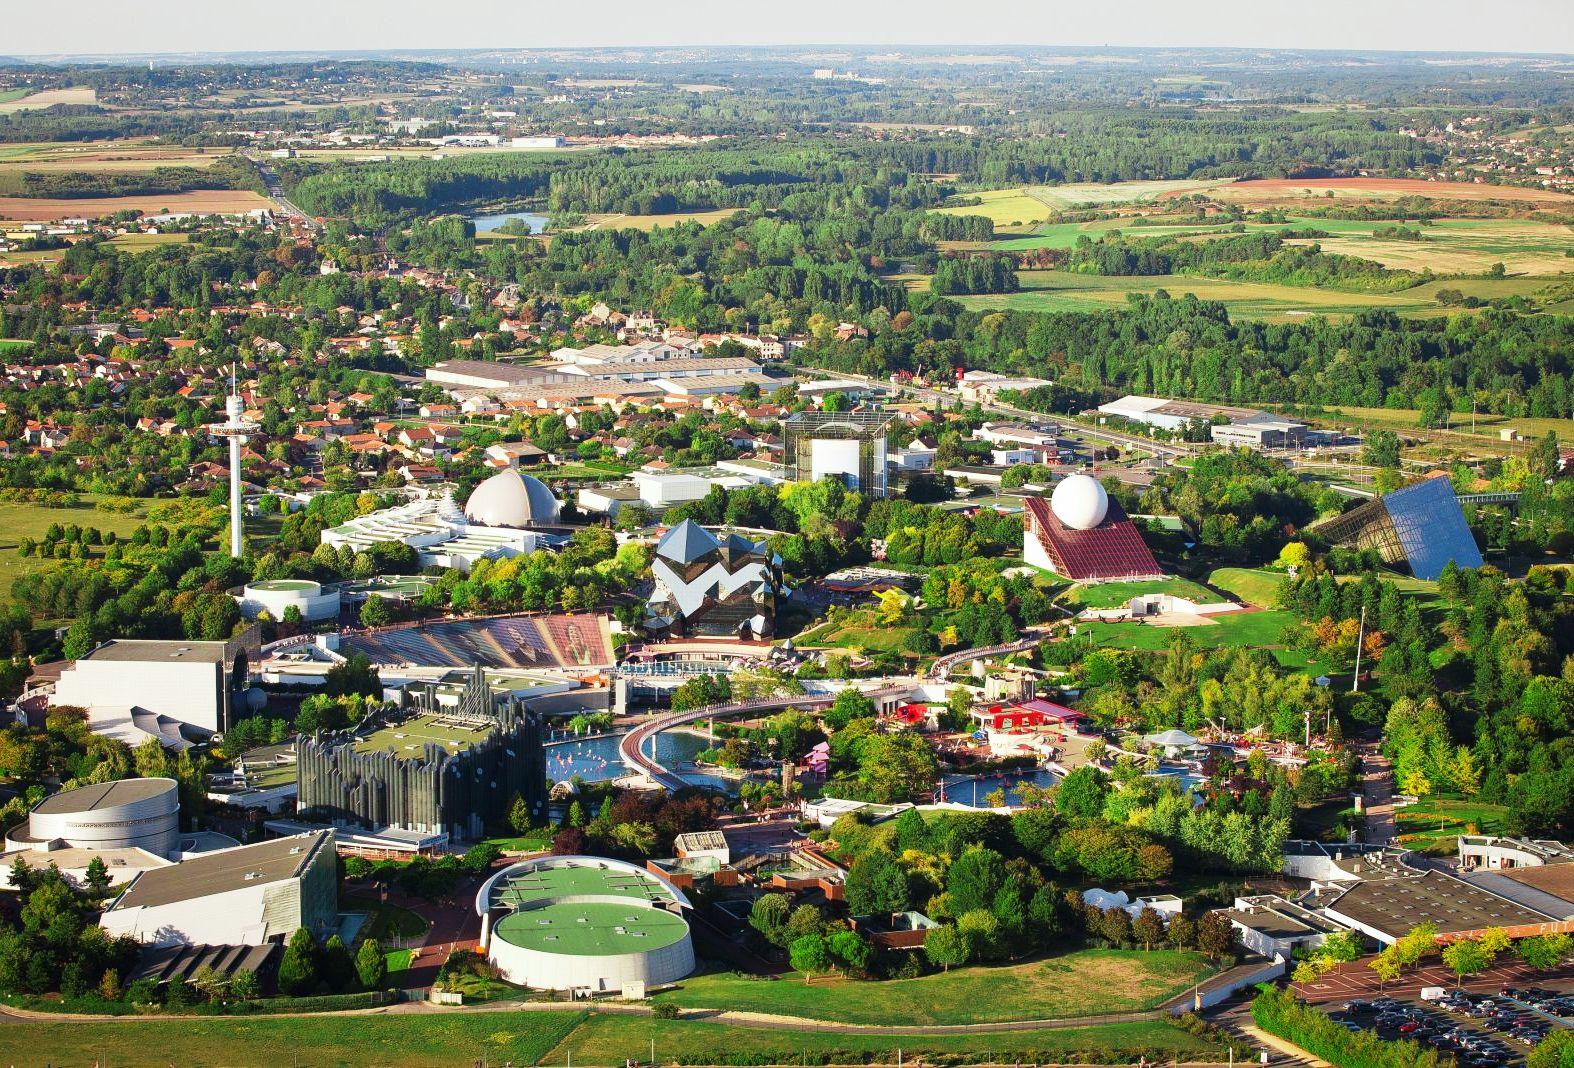 Futuroscope vanuit de lucht - Foto: P.Torset / D.Laming Architecte